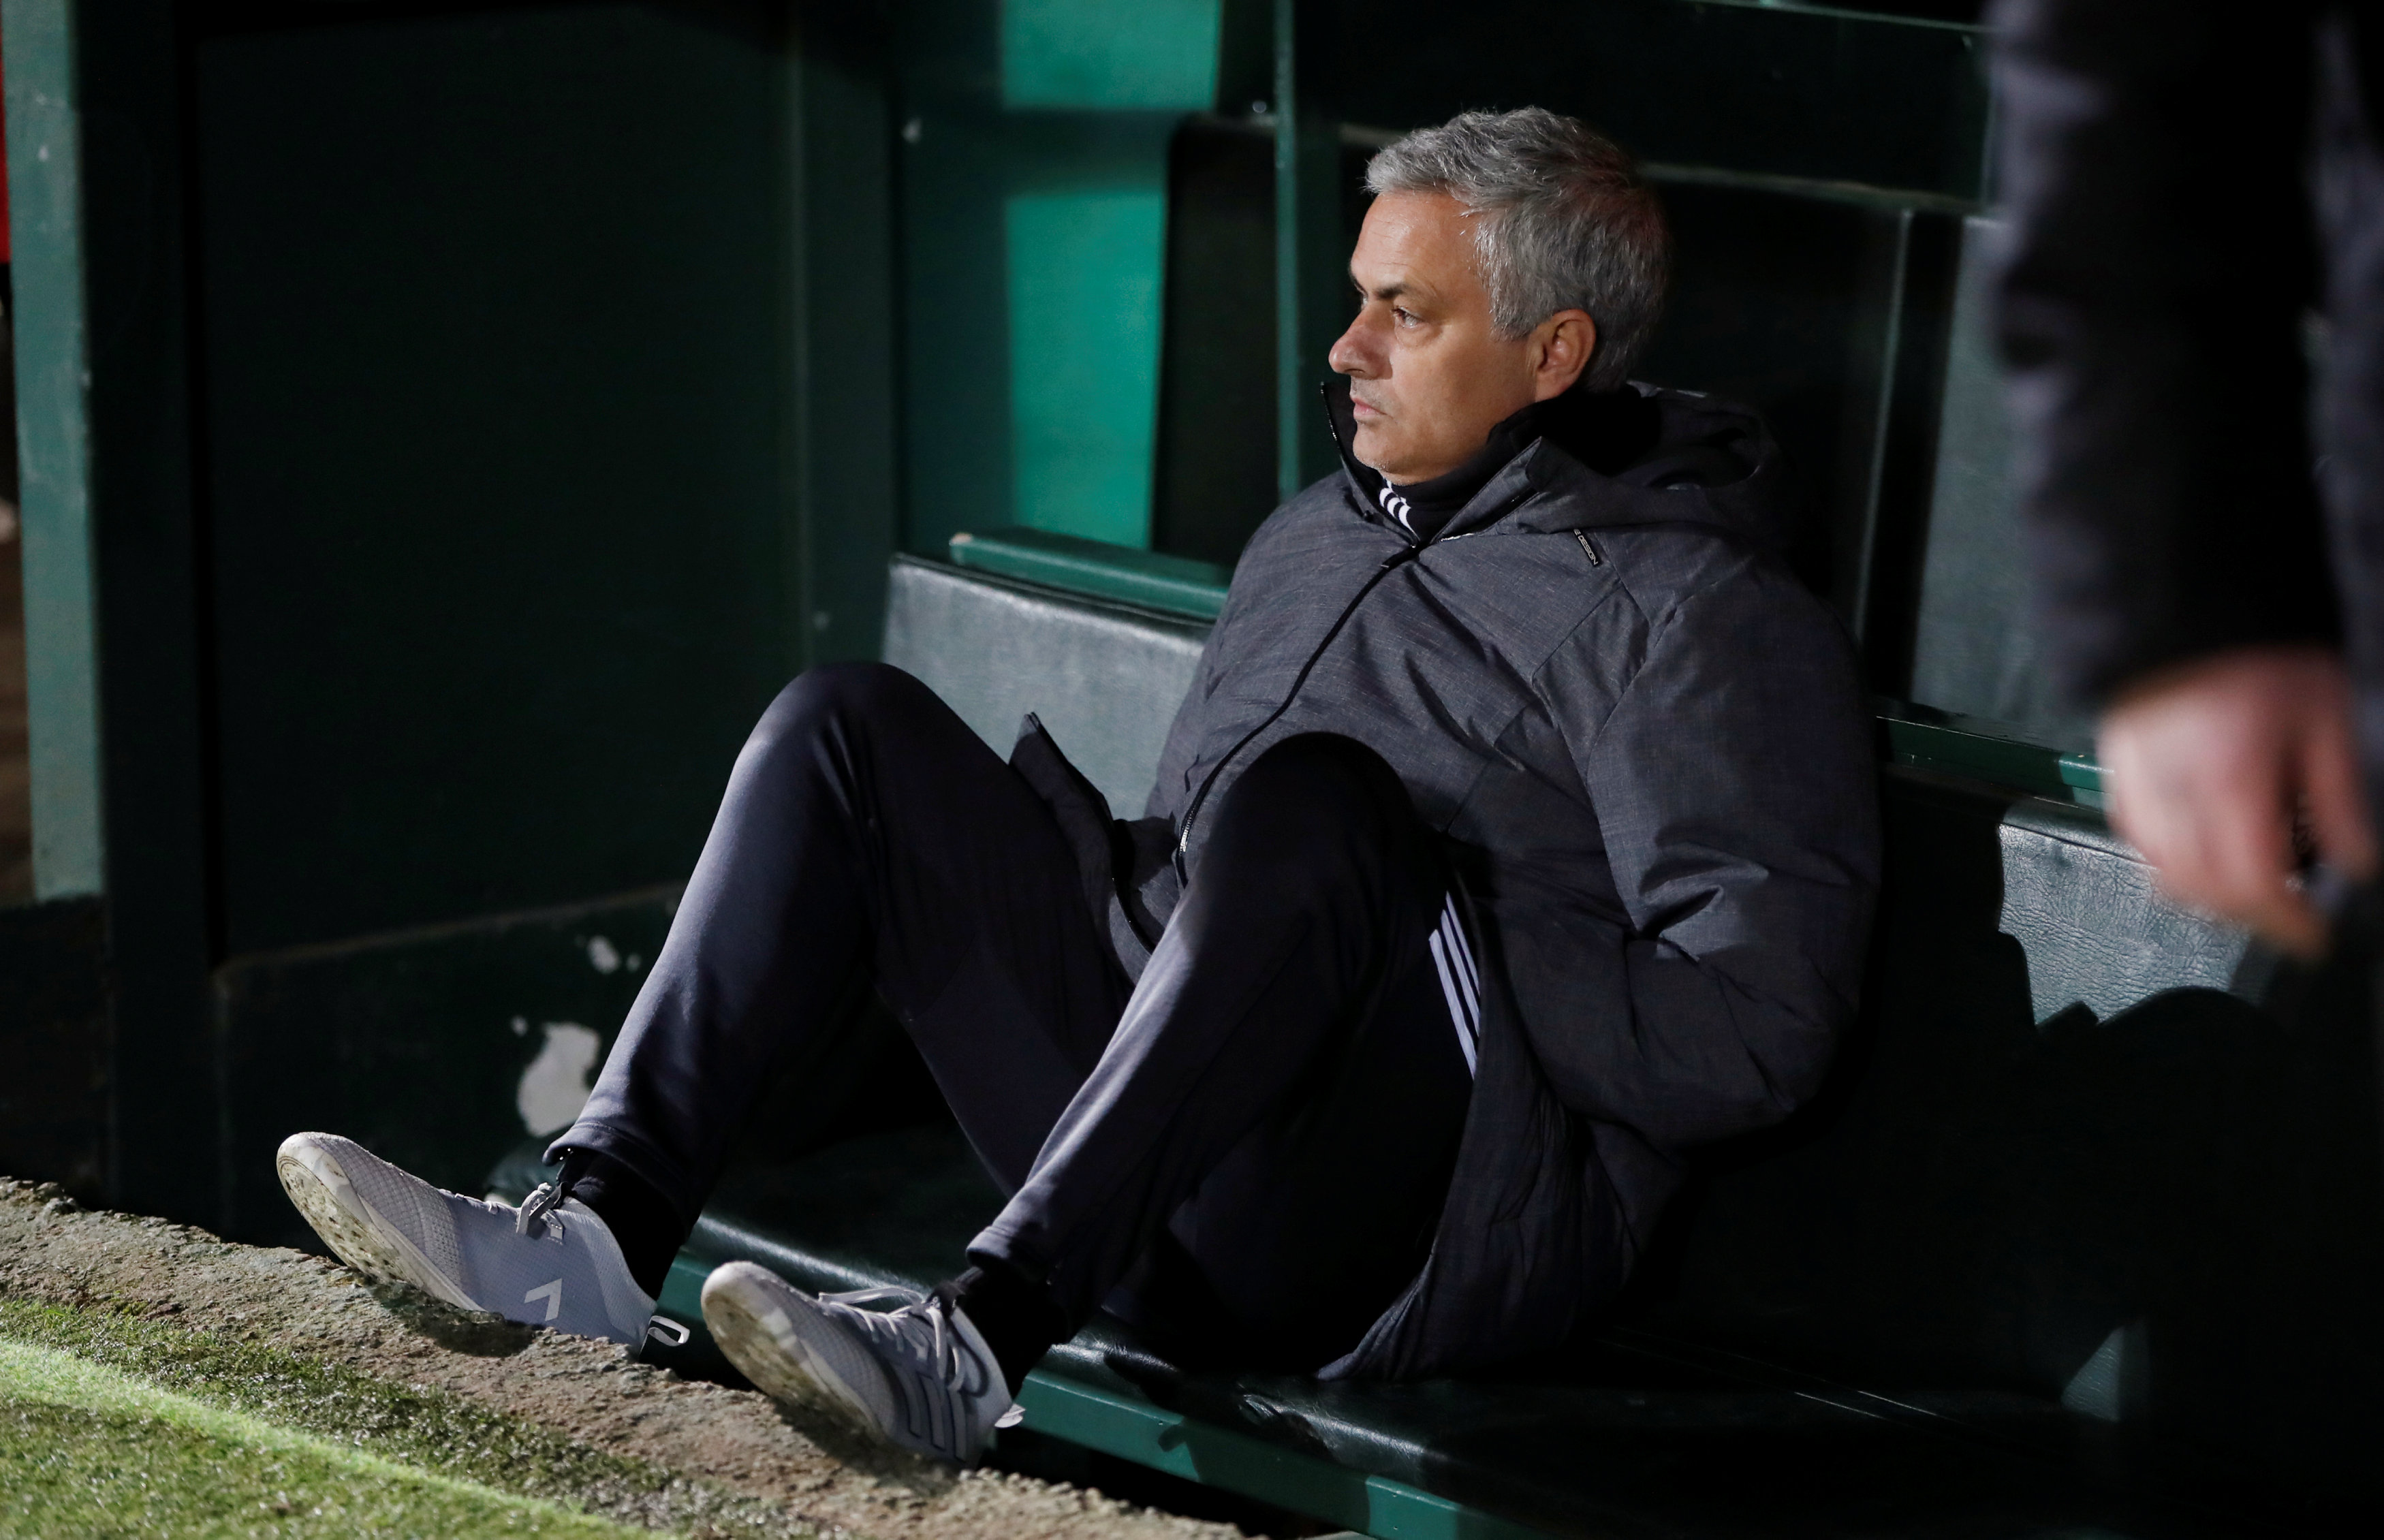 Football: Ibrahimovic free to go if he wants, says Mourinho